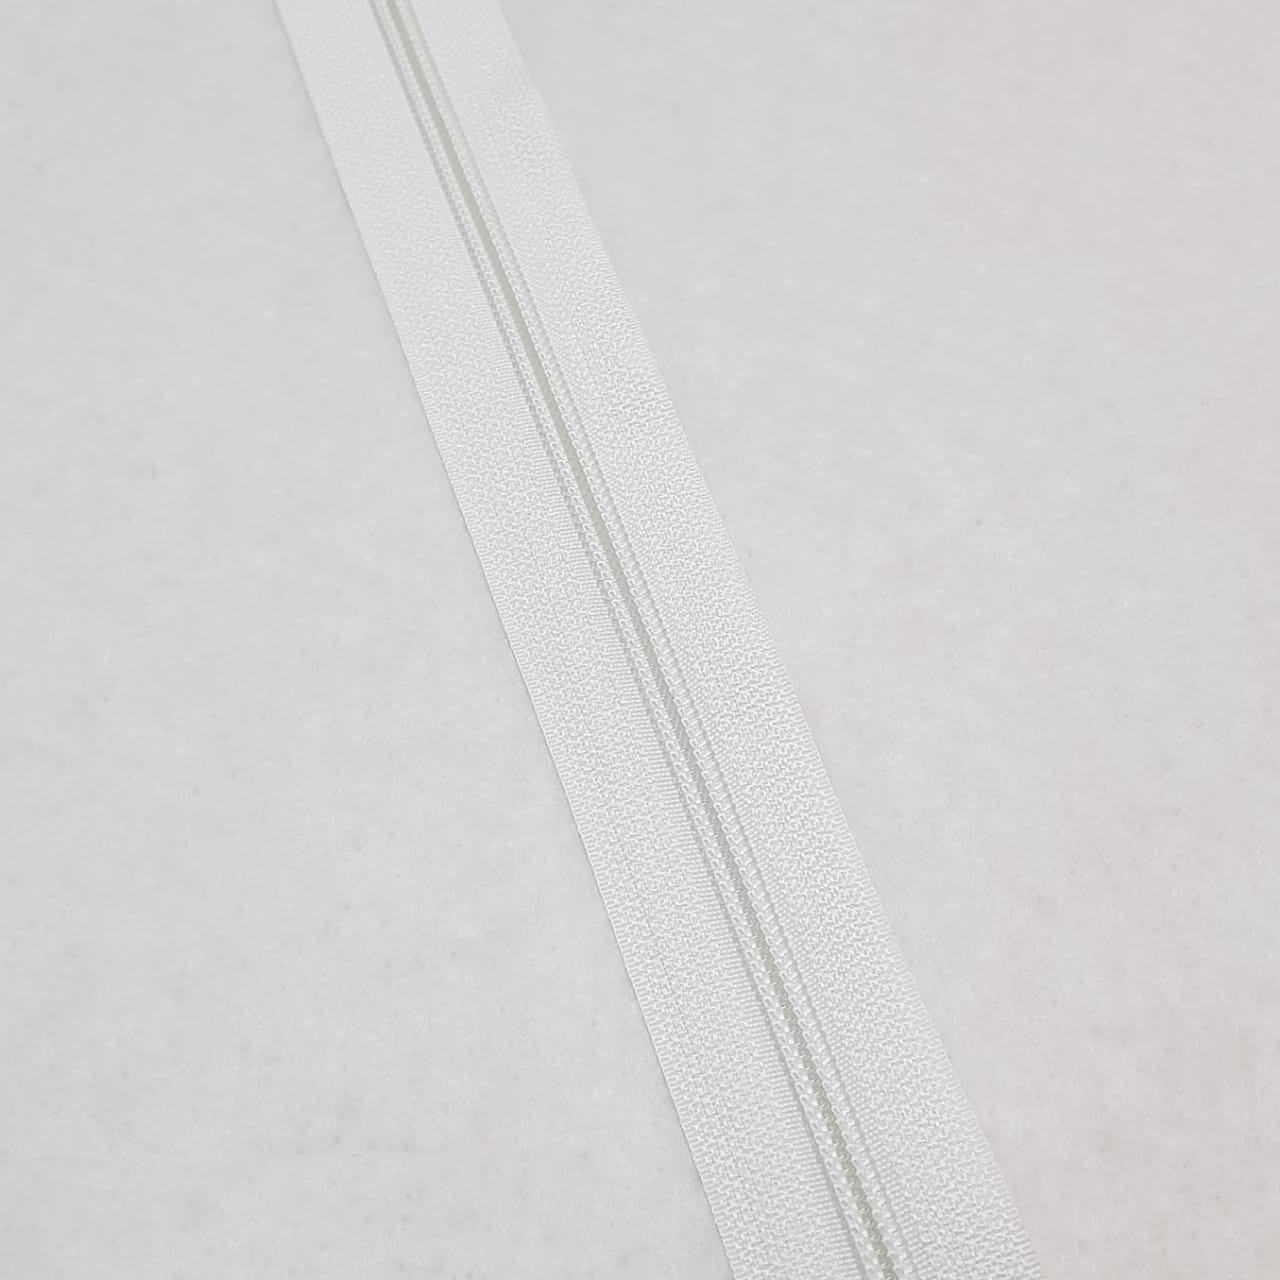 Zíper - ZR - 5mm - Branco